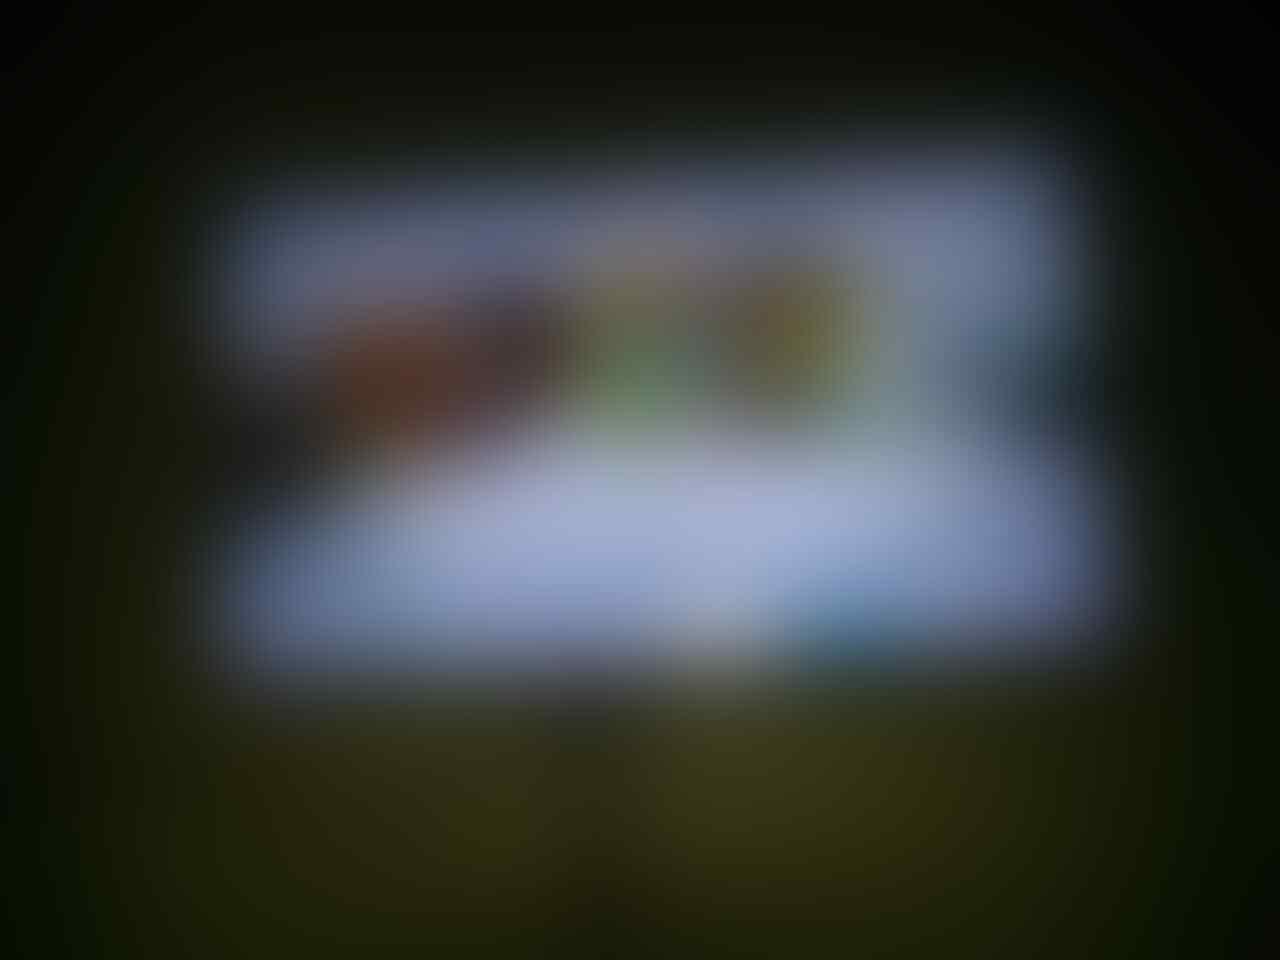 ++ Jasa Hack Softmod Wii/Wii U Loadiine + isi Game via Hardisk di Wii atau Wii U